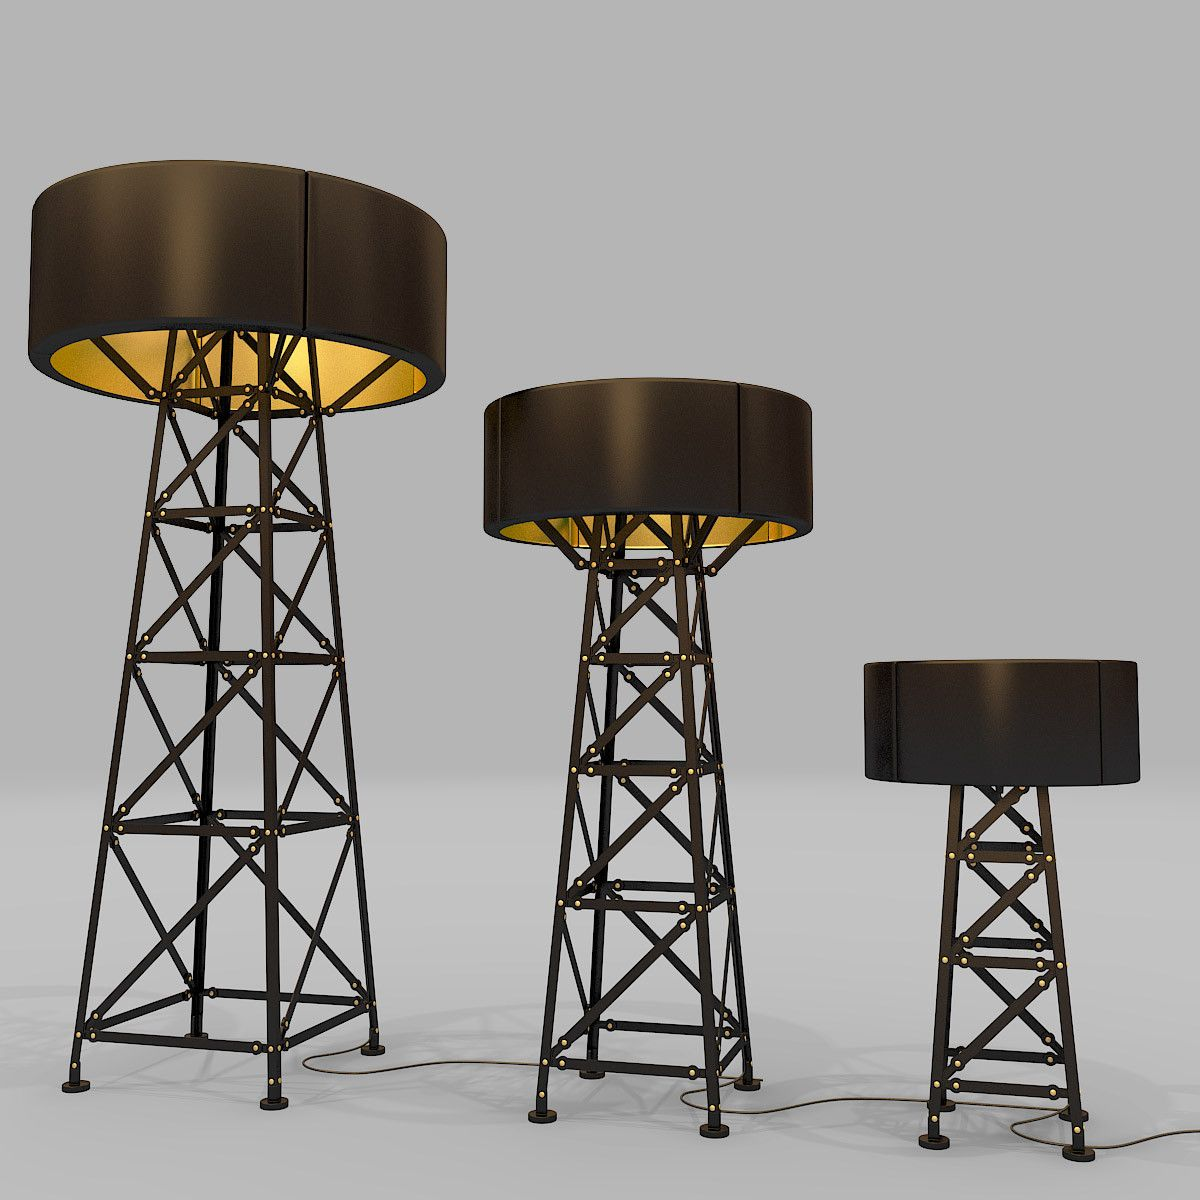 3d Moooi Construction Lamp 3d Model Lamp Floor Lamp Steampunk Lamp